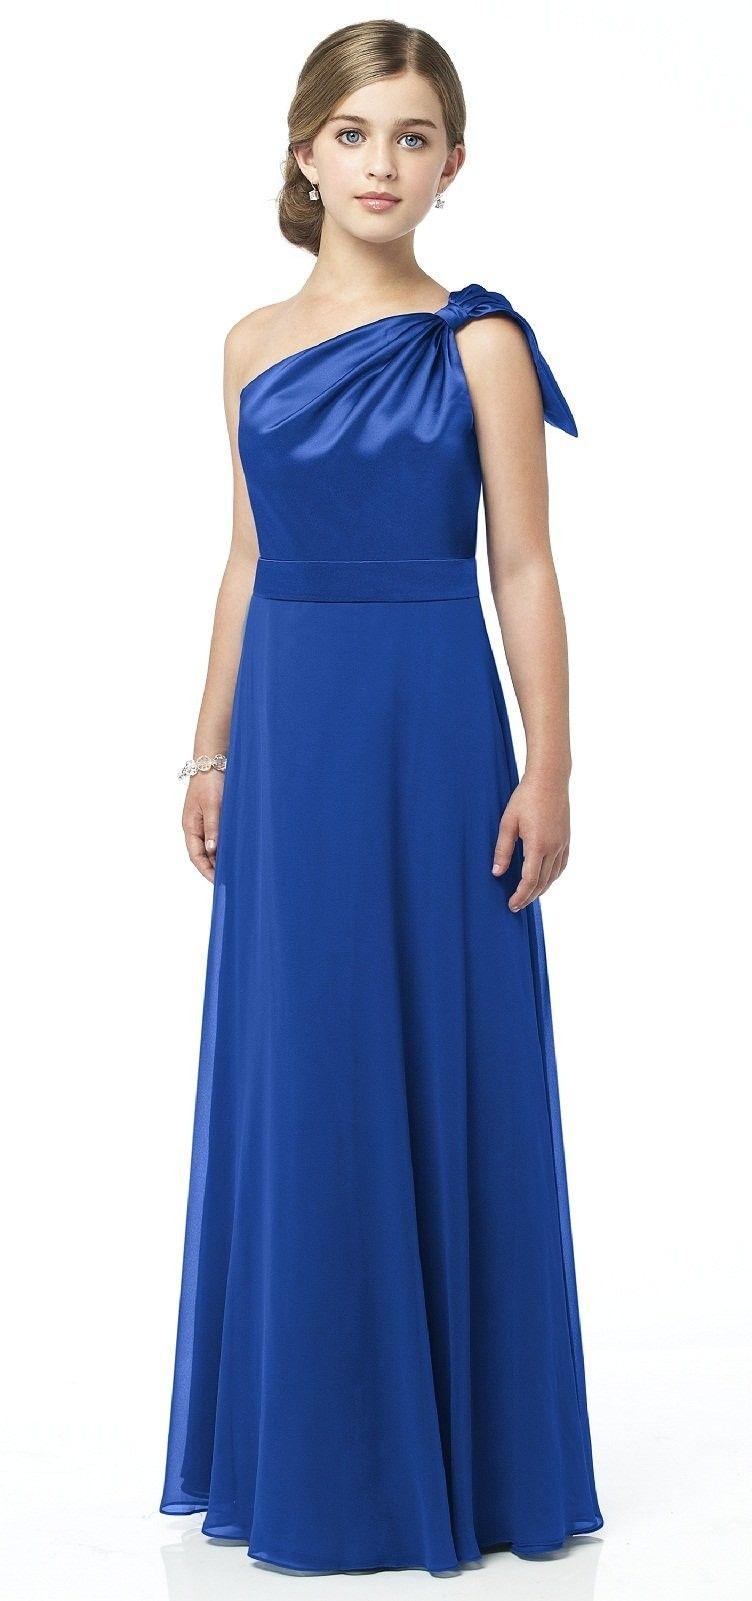 Dessy bridesmaid dress sapphire dream wedding pinterest